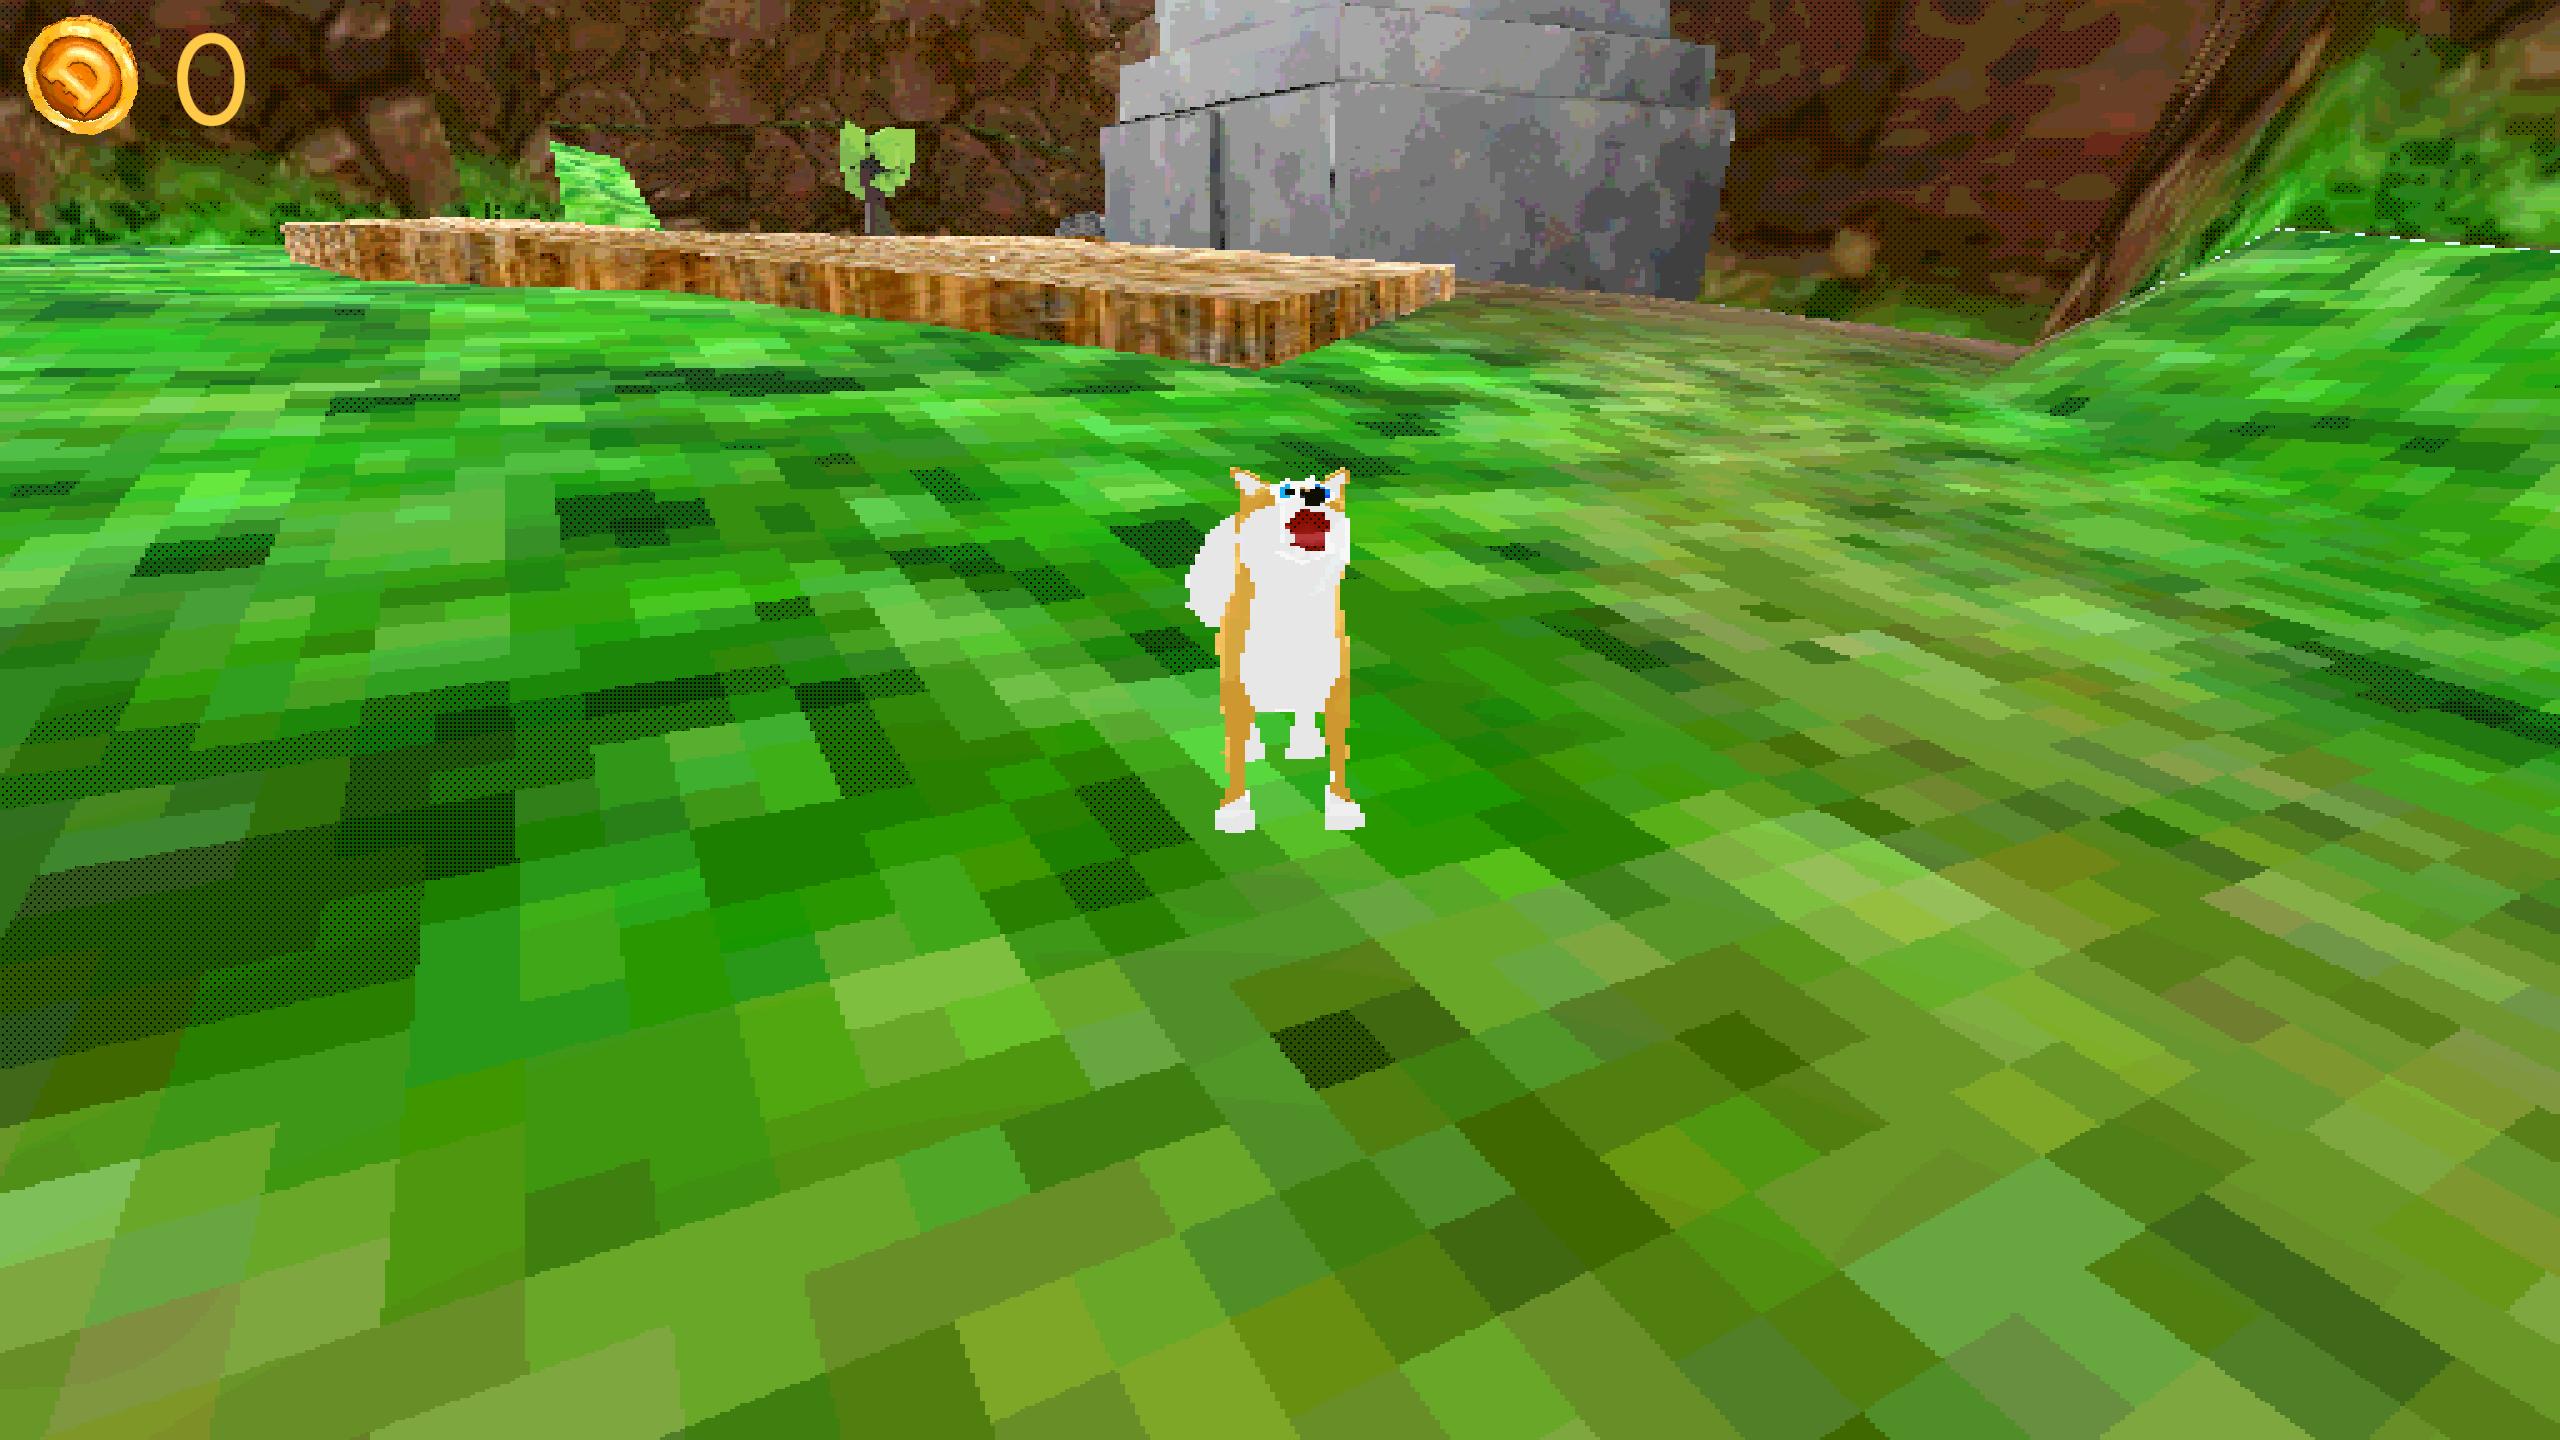 Story of Shiba - Dogecoin Game Jam entry